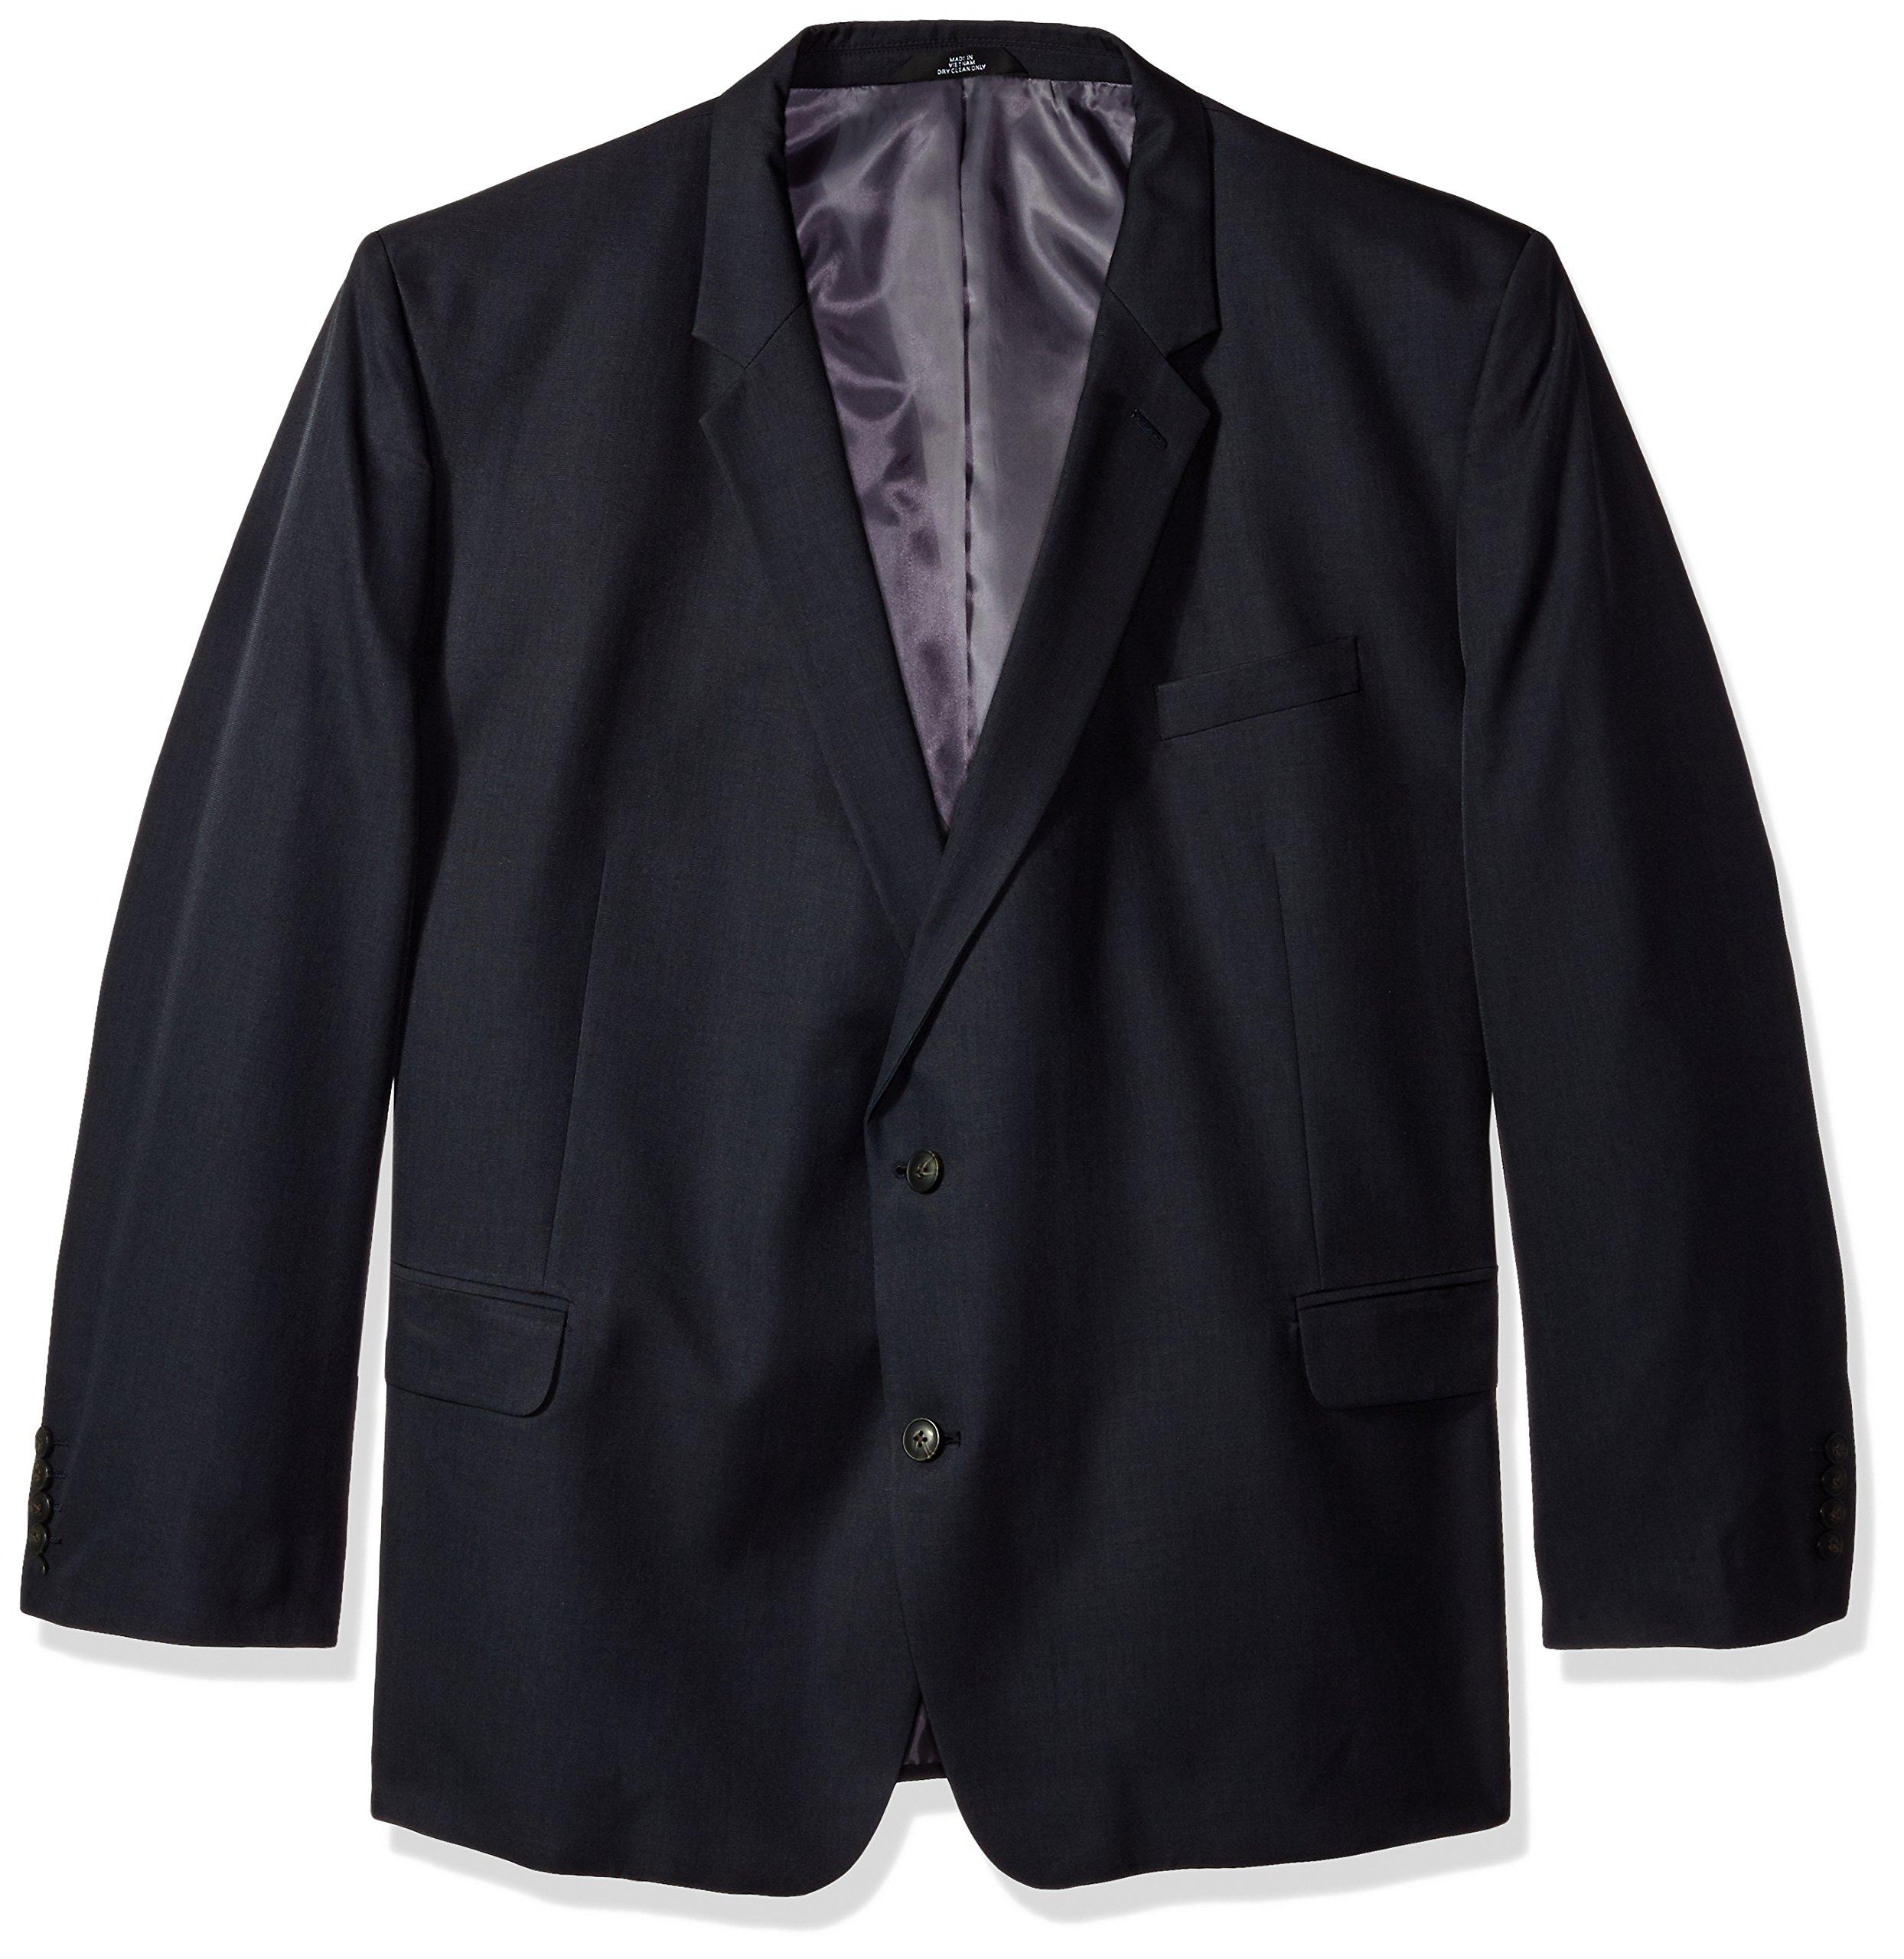 Haggar Men's Big and Tall J.m Premium Stretch Classic Fit 2-Button Coat, Dark Navy, 58R